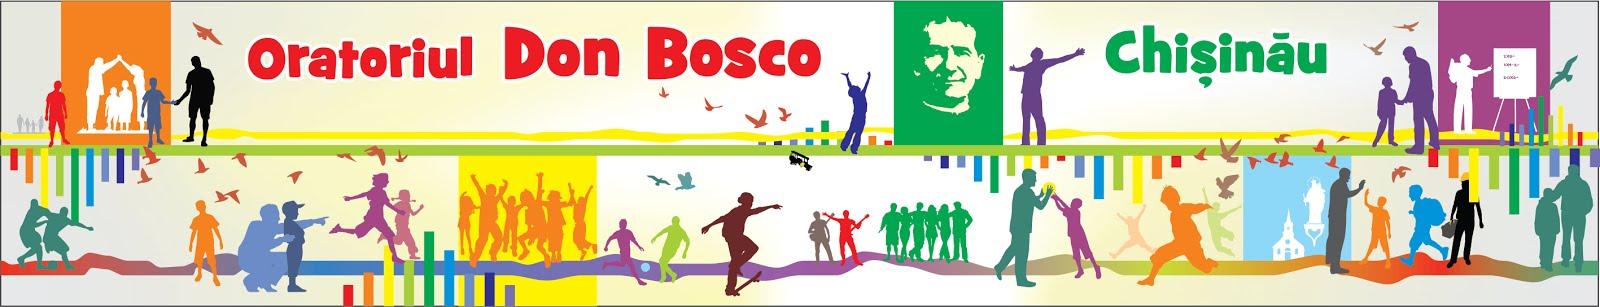 Oratoriul Don Bosco Chisinau